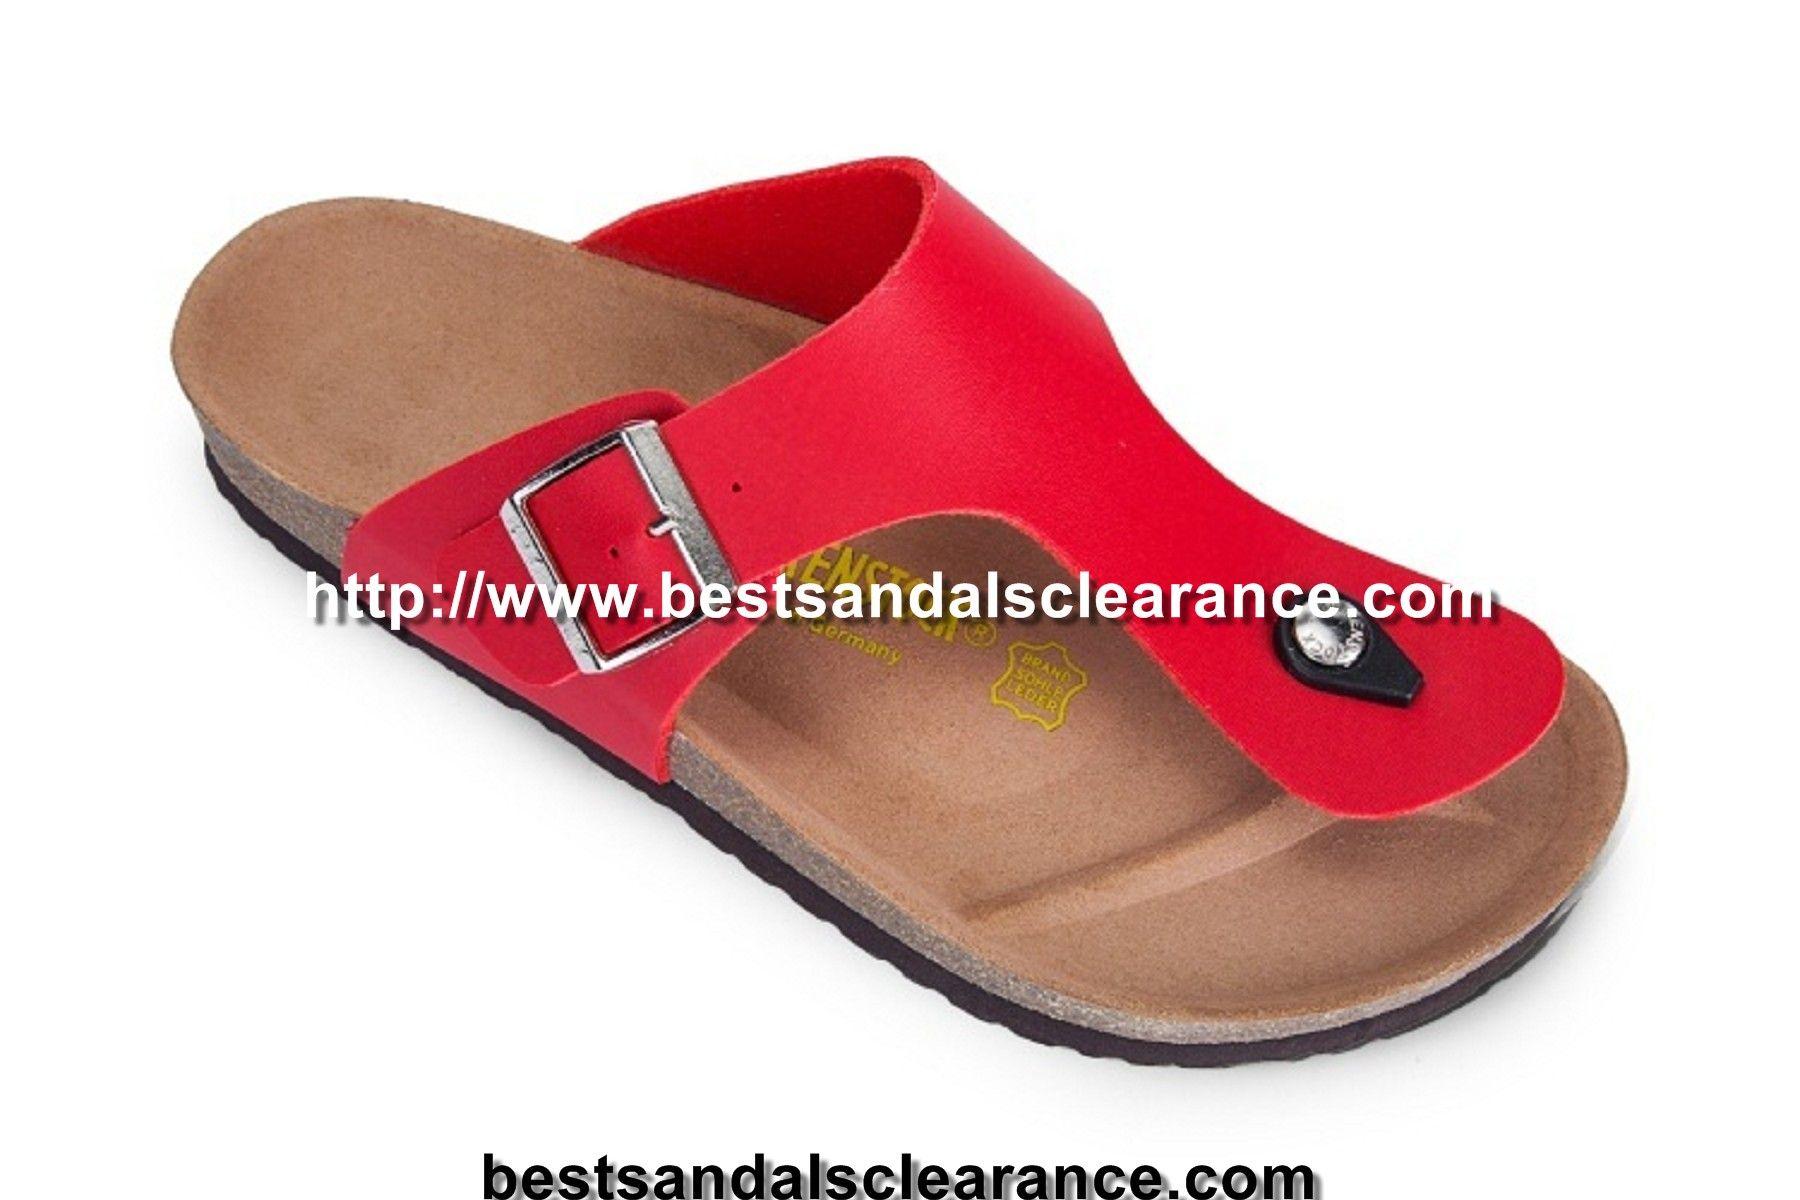 397d6afcb9e1 Old Style Birkenstock Gizeh Mens Leather Sandals Red